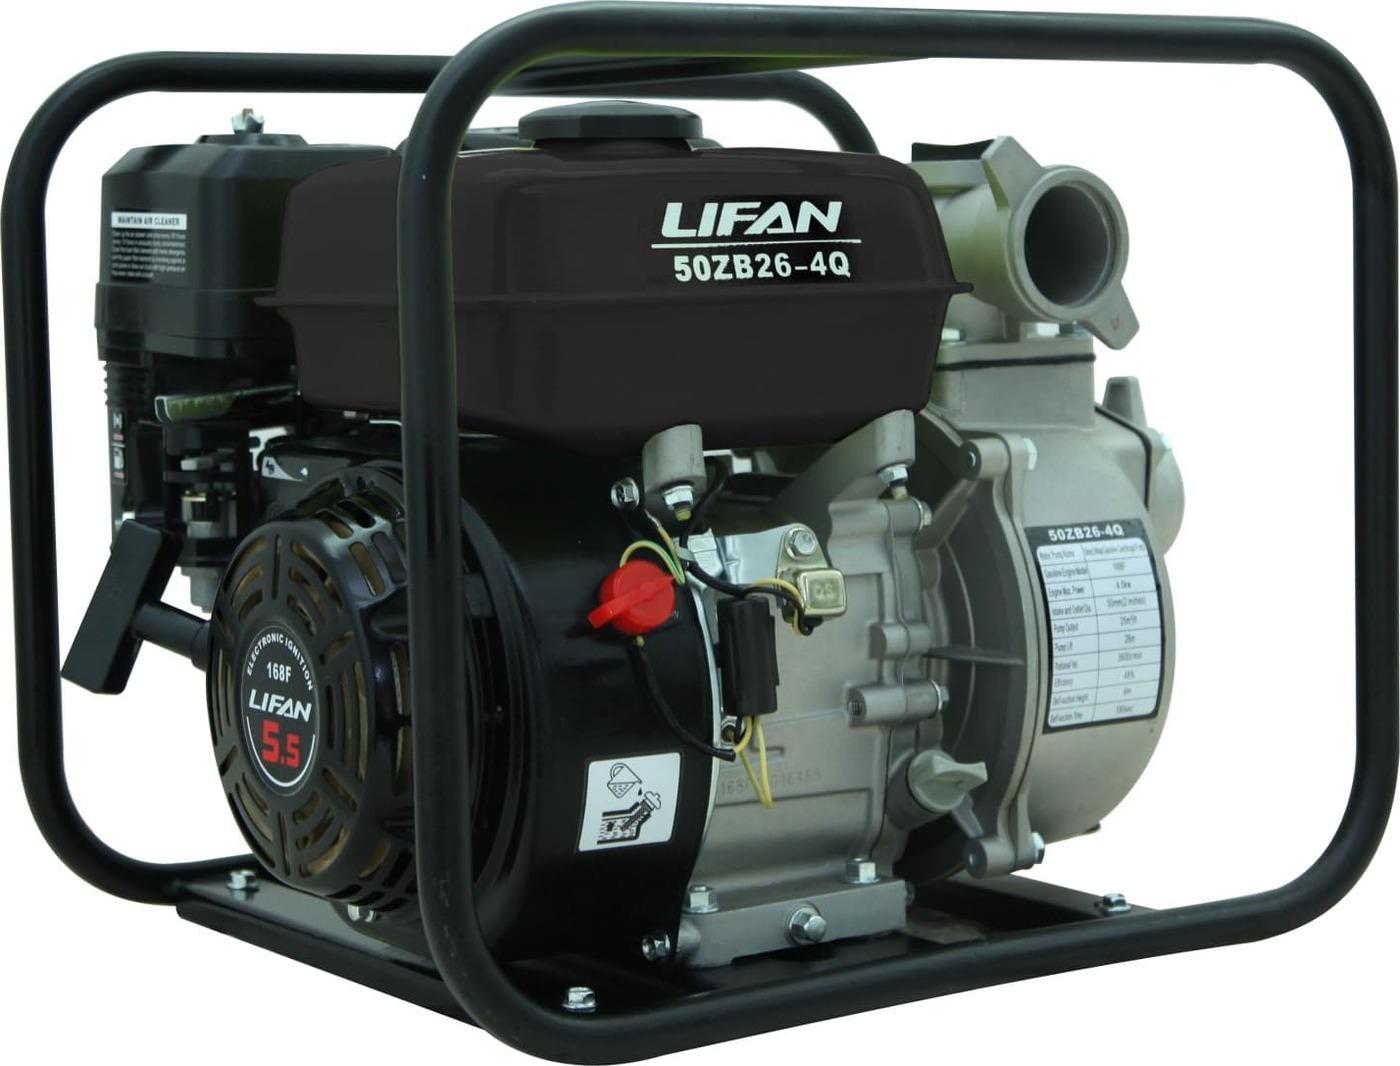 Мотопомпа бензиновая LIFAN 50ZB26-4Q виброплита vektor vpg 50b lifan л с 2 6 kh 12 40 см сек